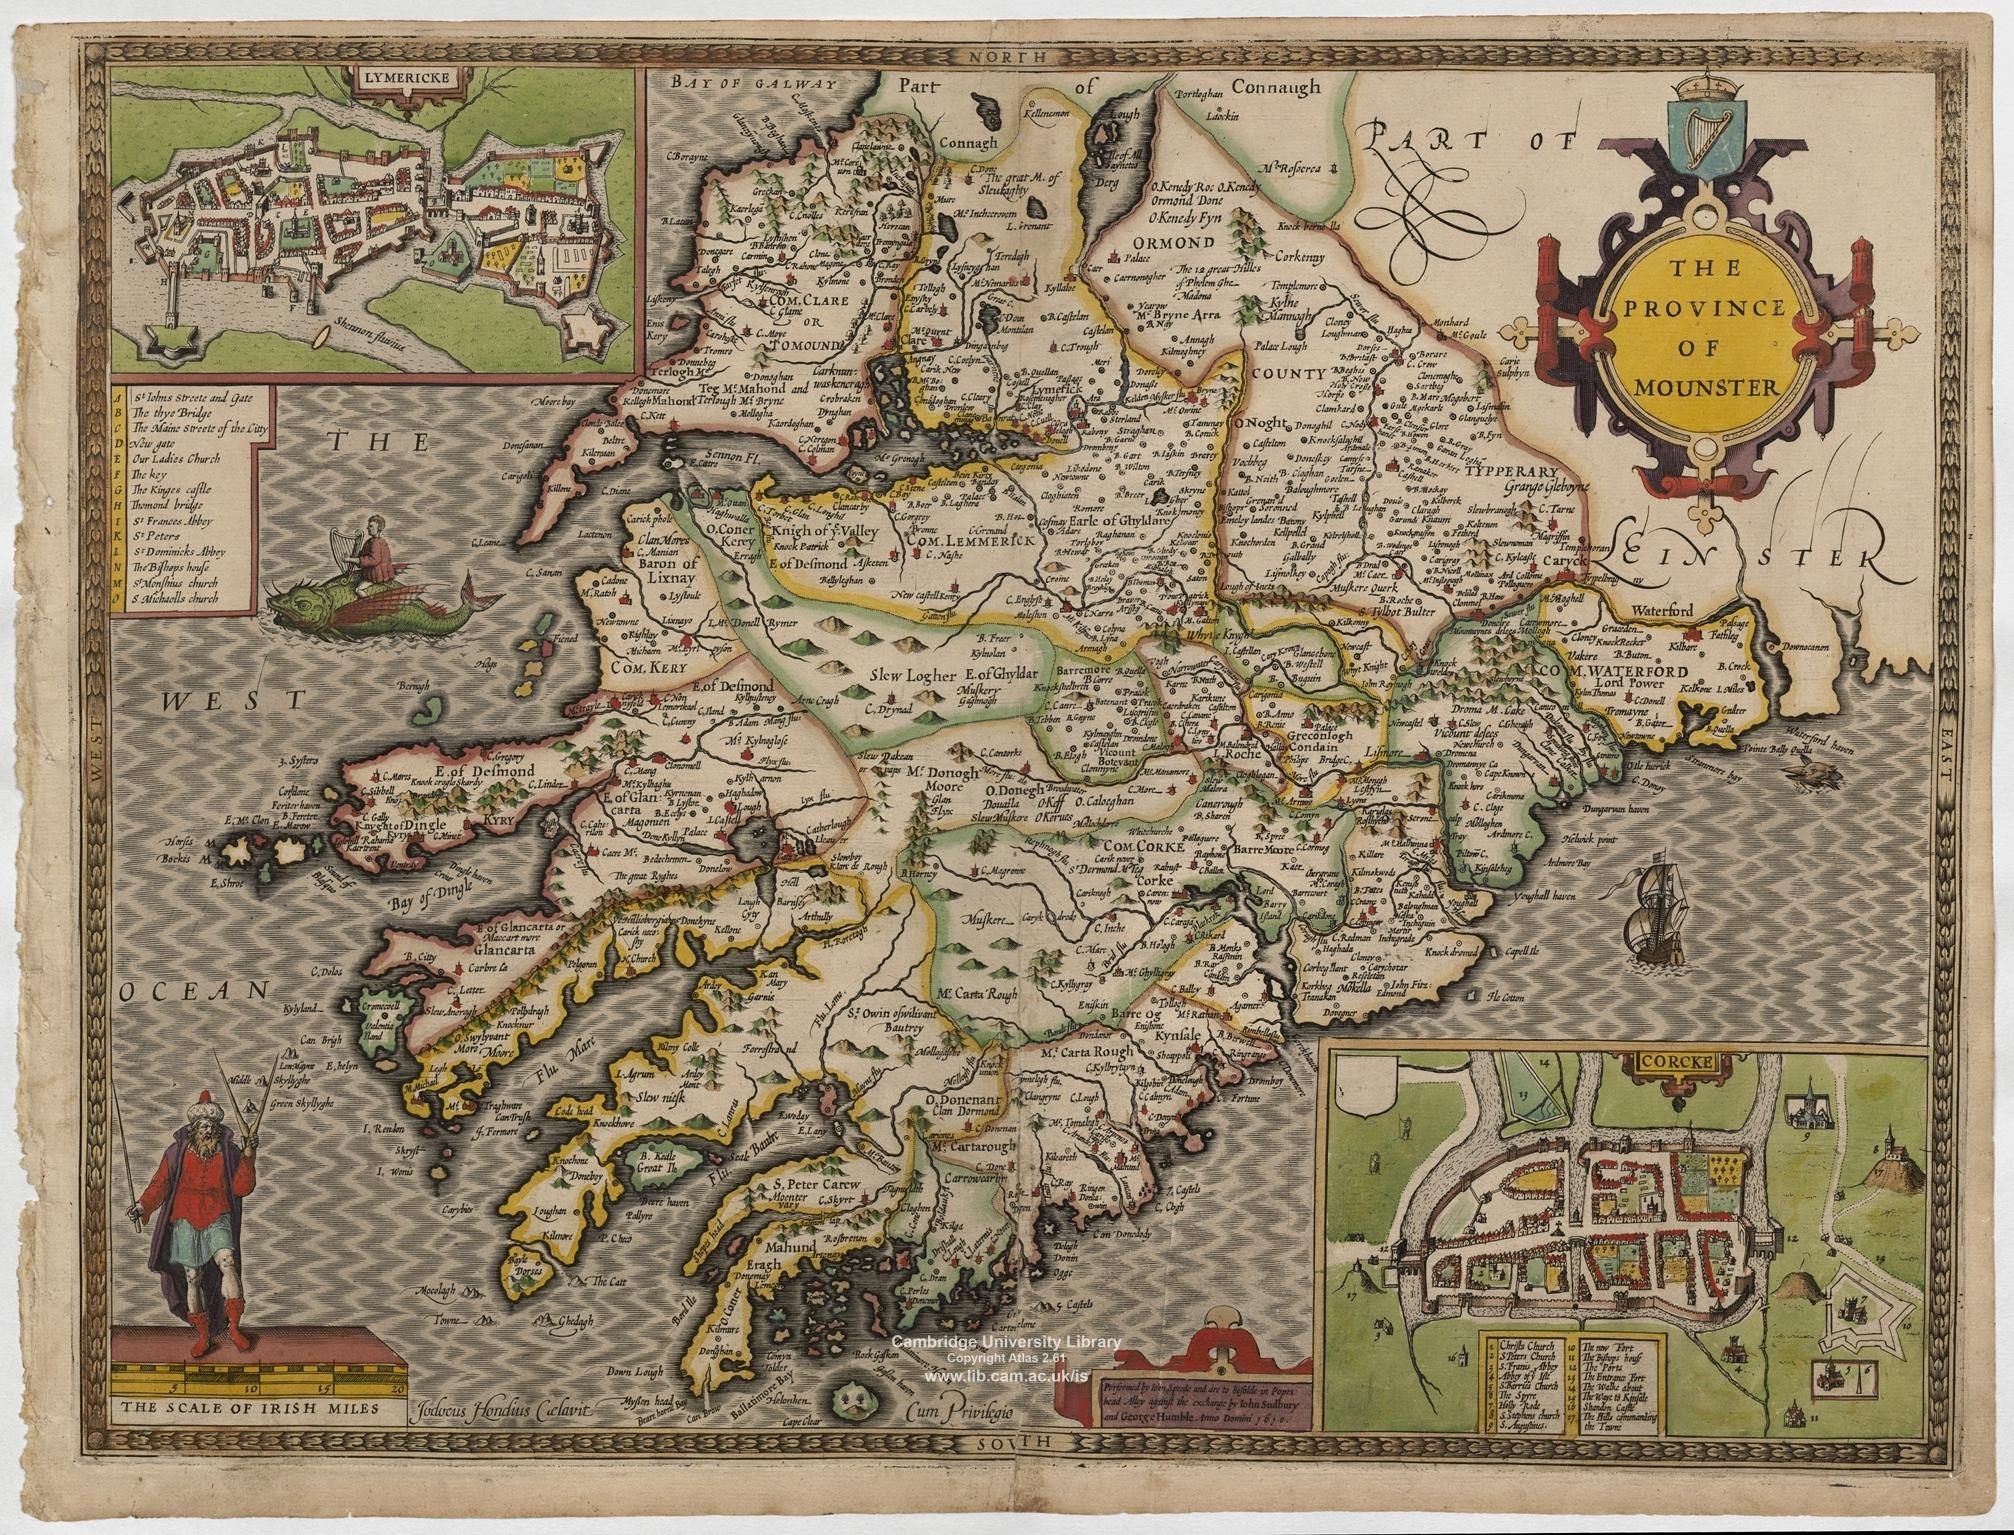 1611 in Ireland